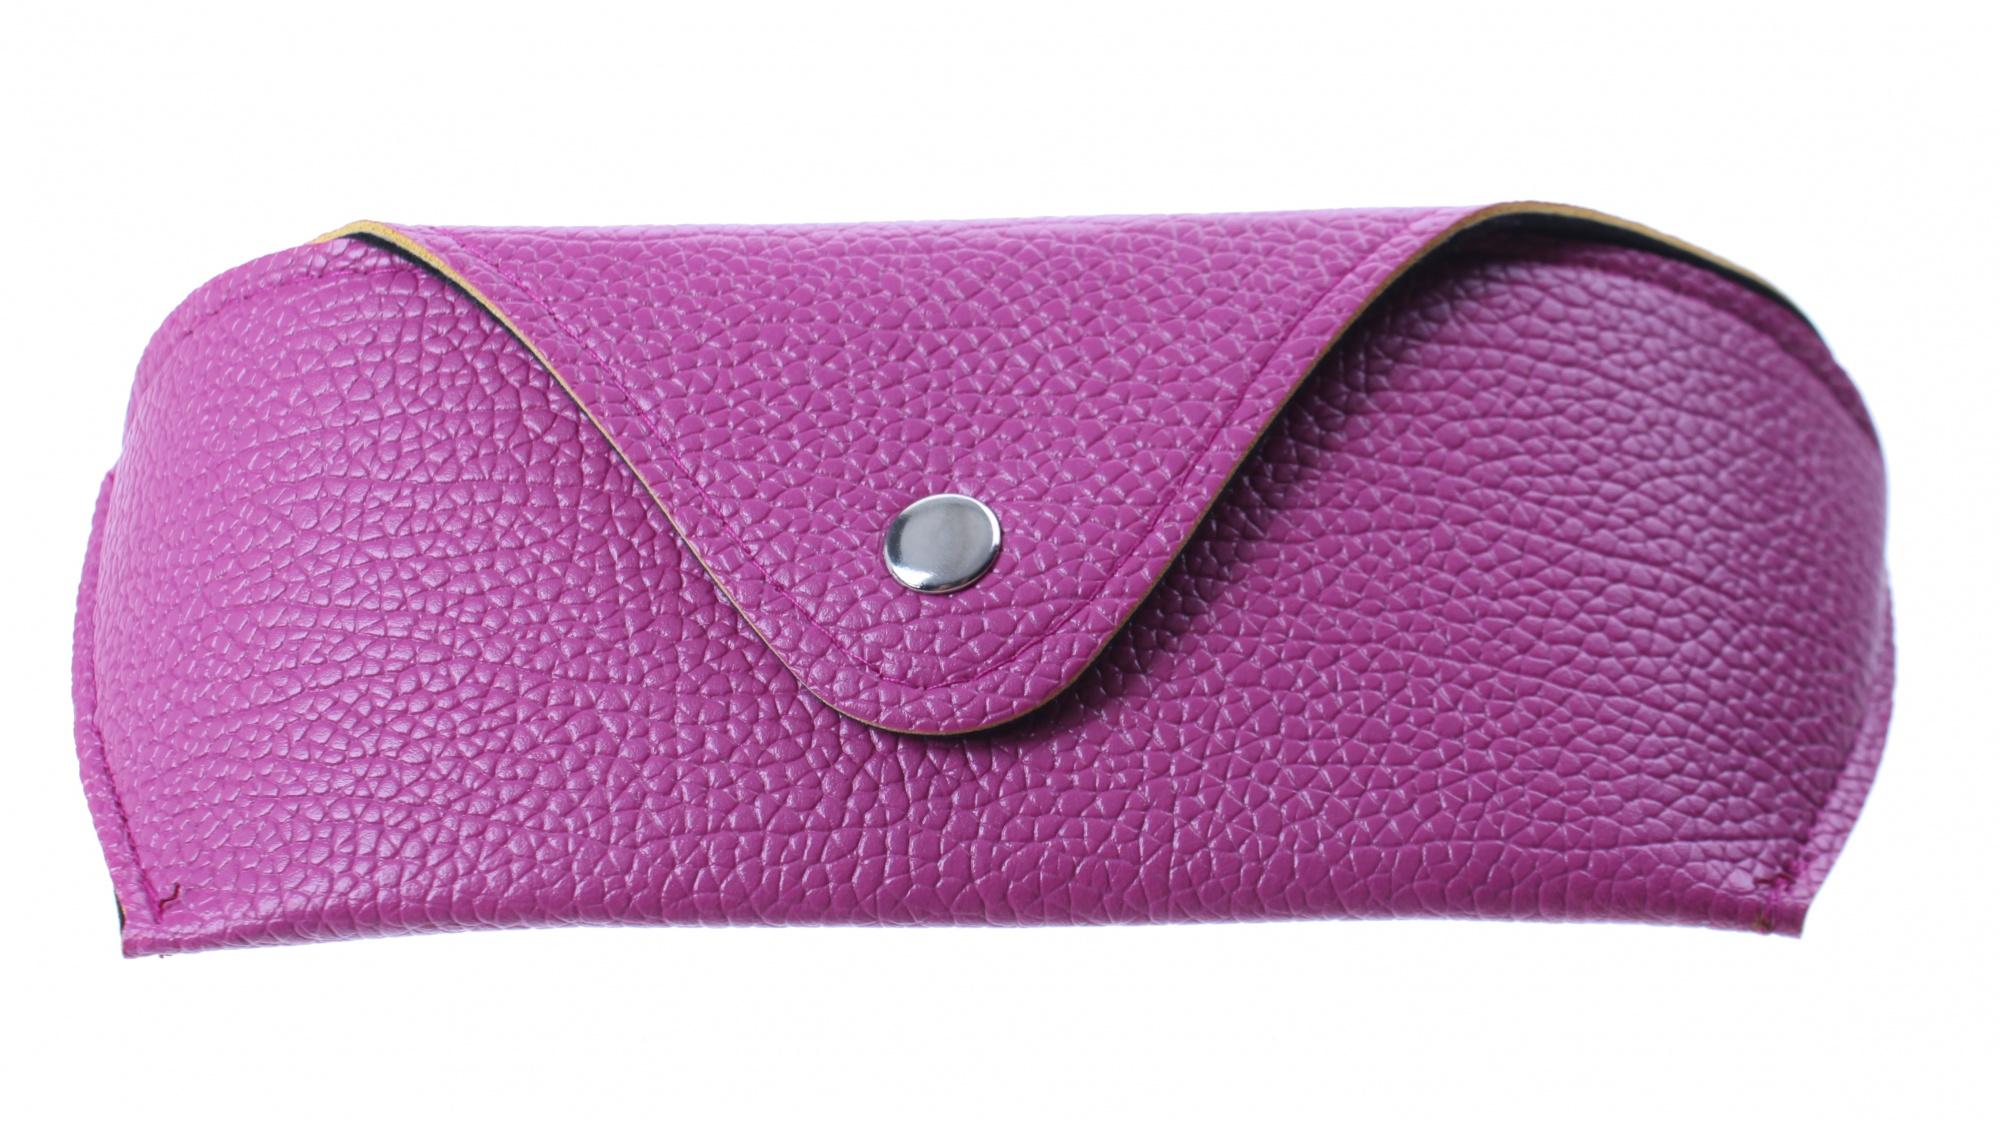 14c2eb40eefdb9 Lifetime-Vision zonnebril dames goud met paarse spiegellens - Giga ...